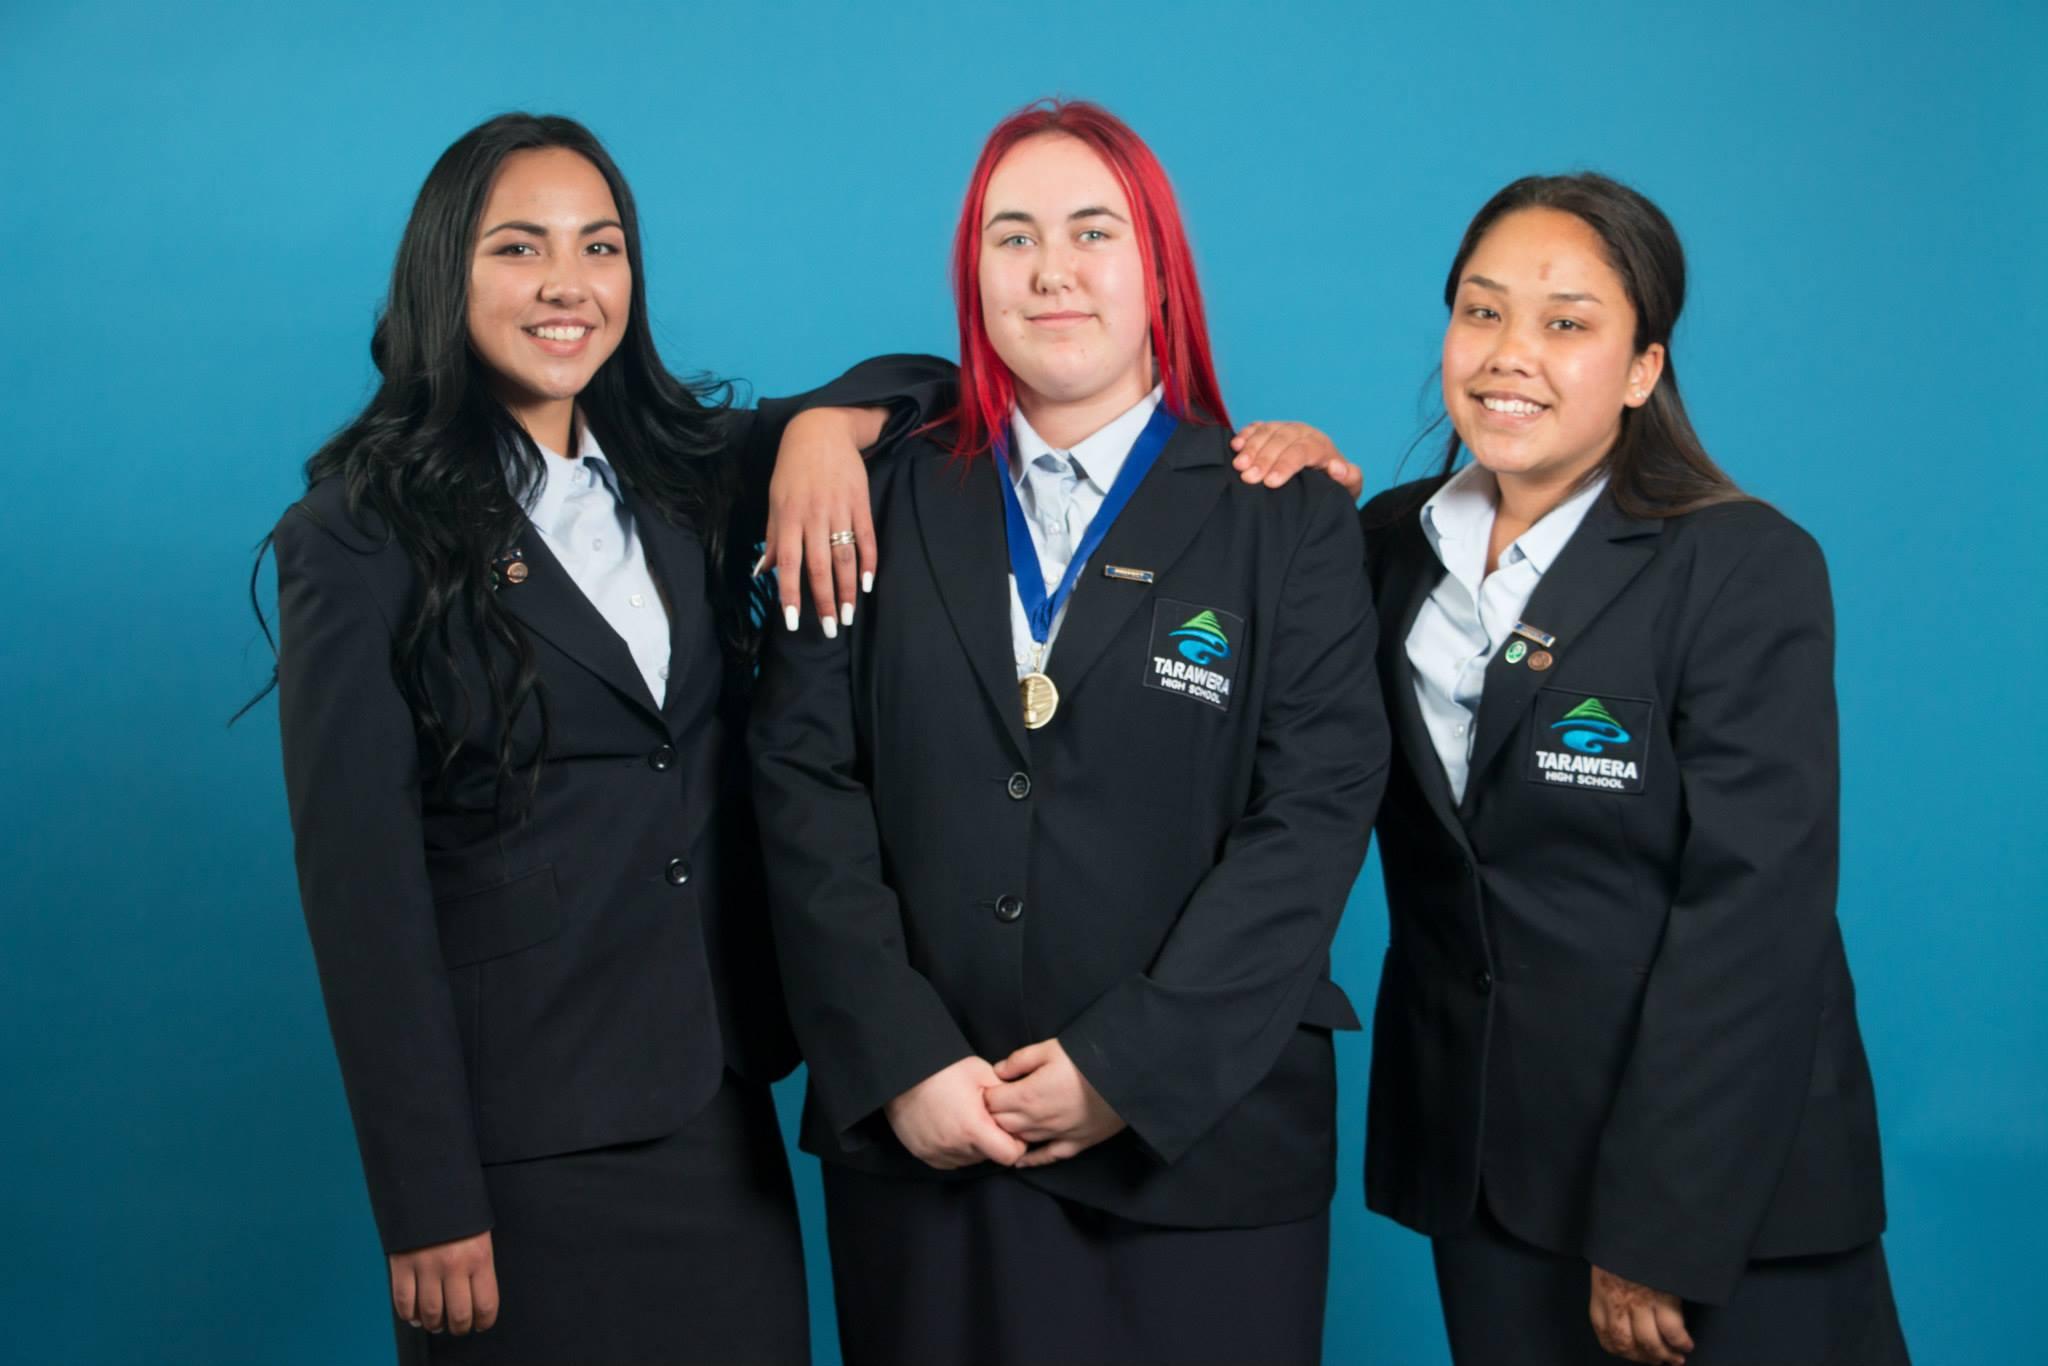 Tarawera High School